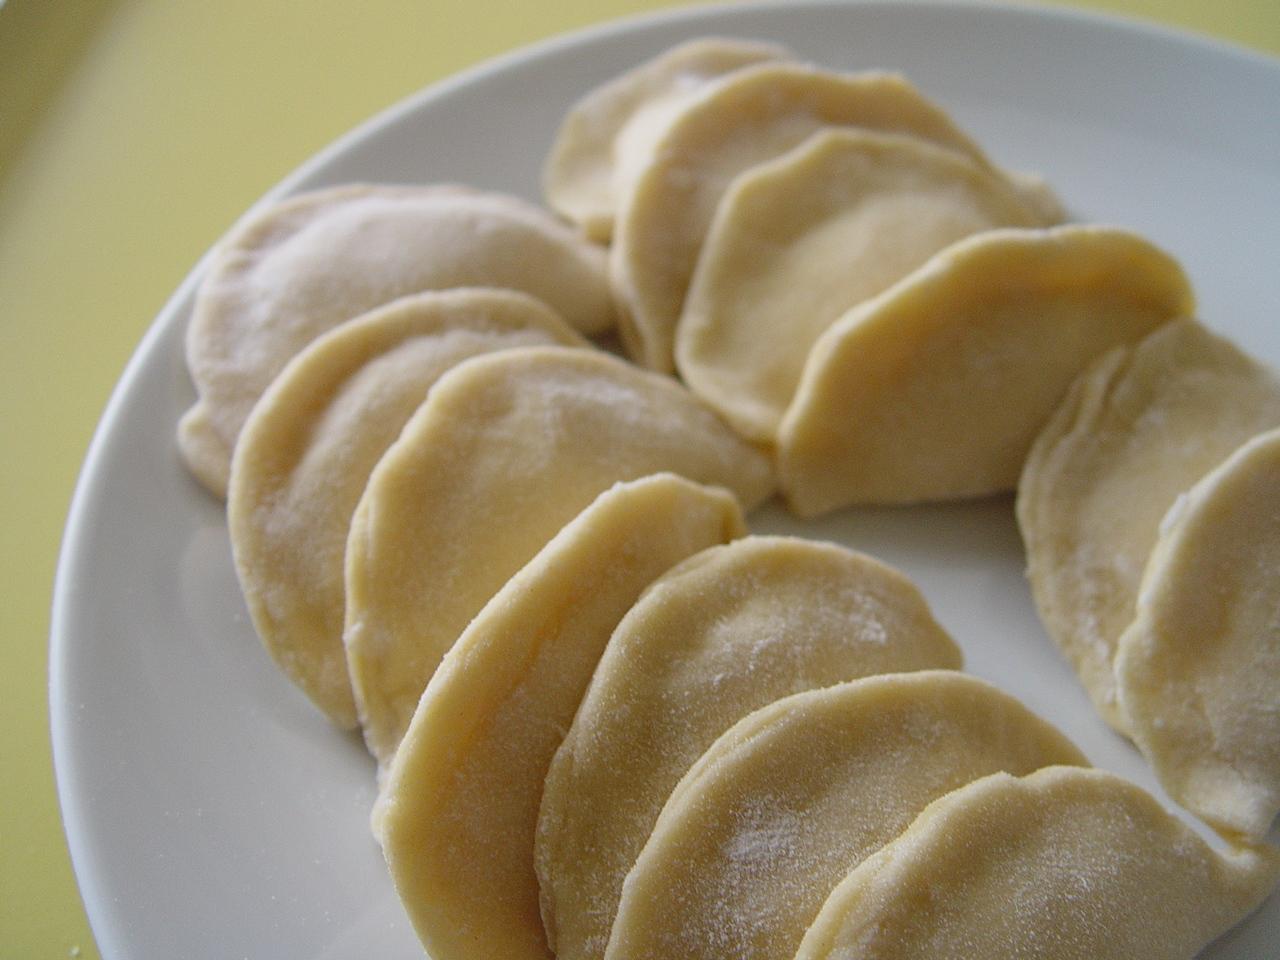 EC: When Dumplings Are Resistance